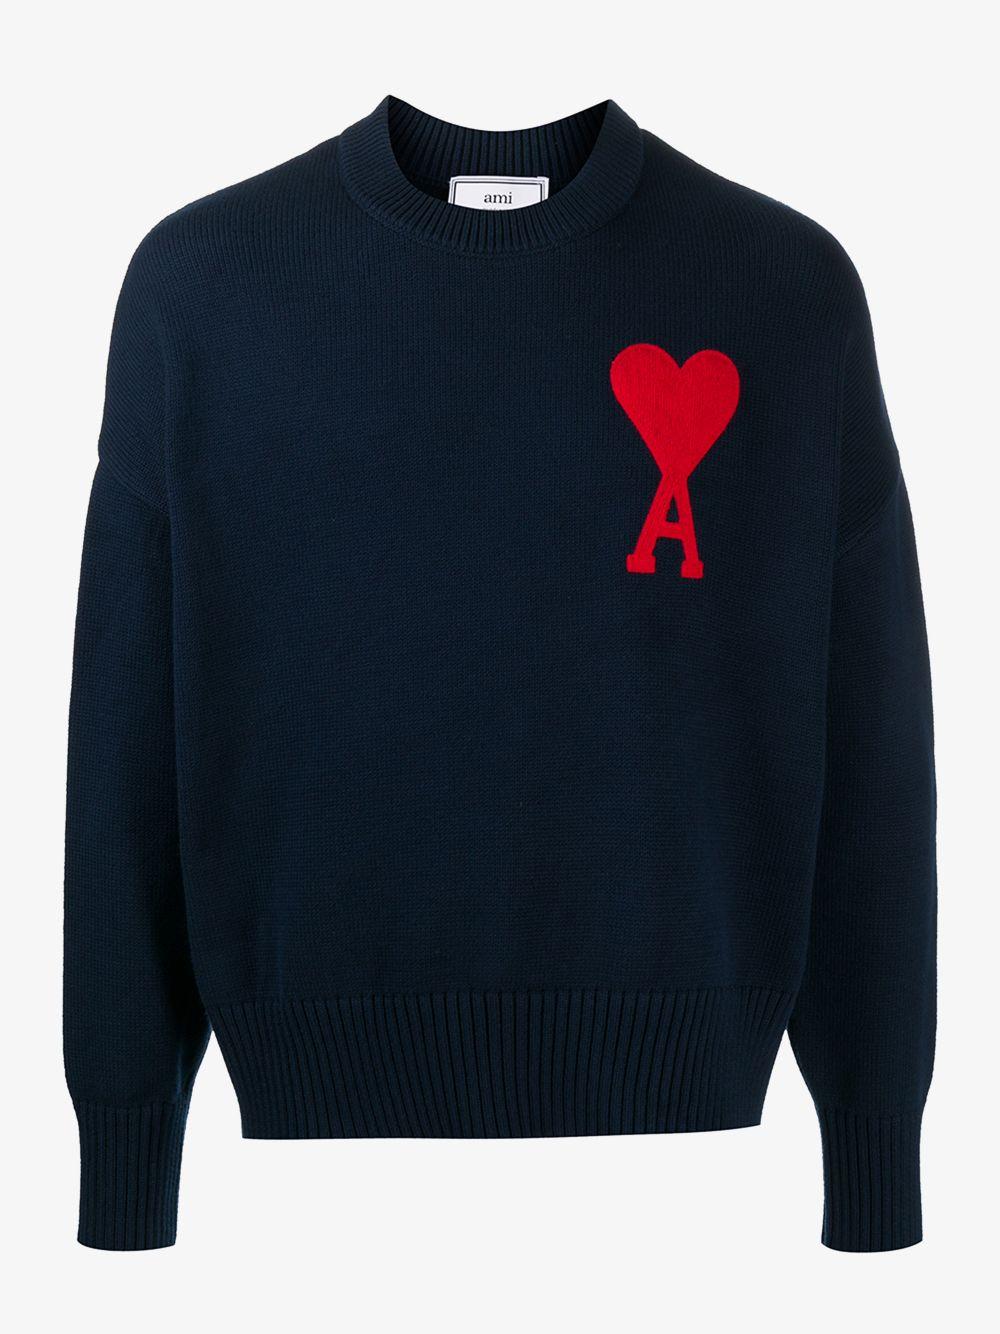 LOGO KNITWEAR AMI - ALEXANDRE MATTIUSSI   Sweaters   E21HK009.016410